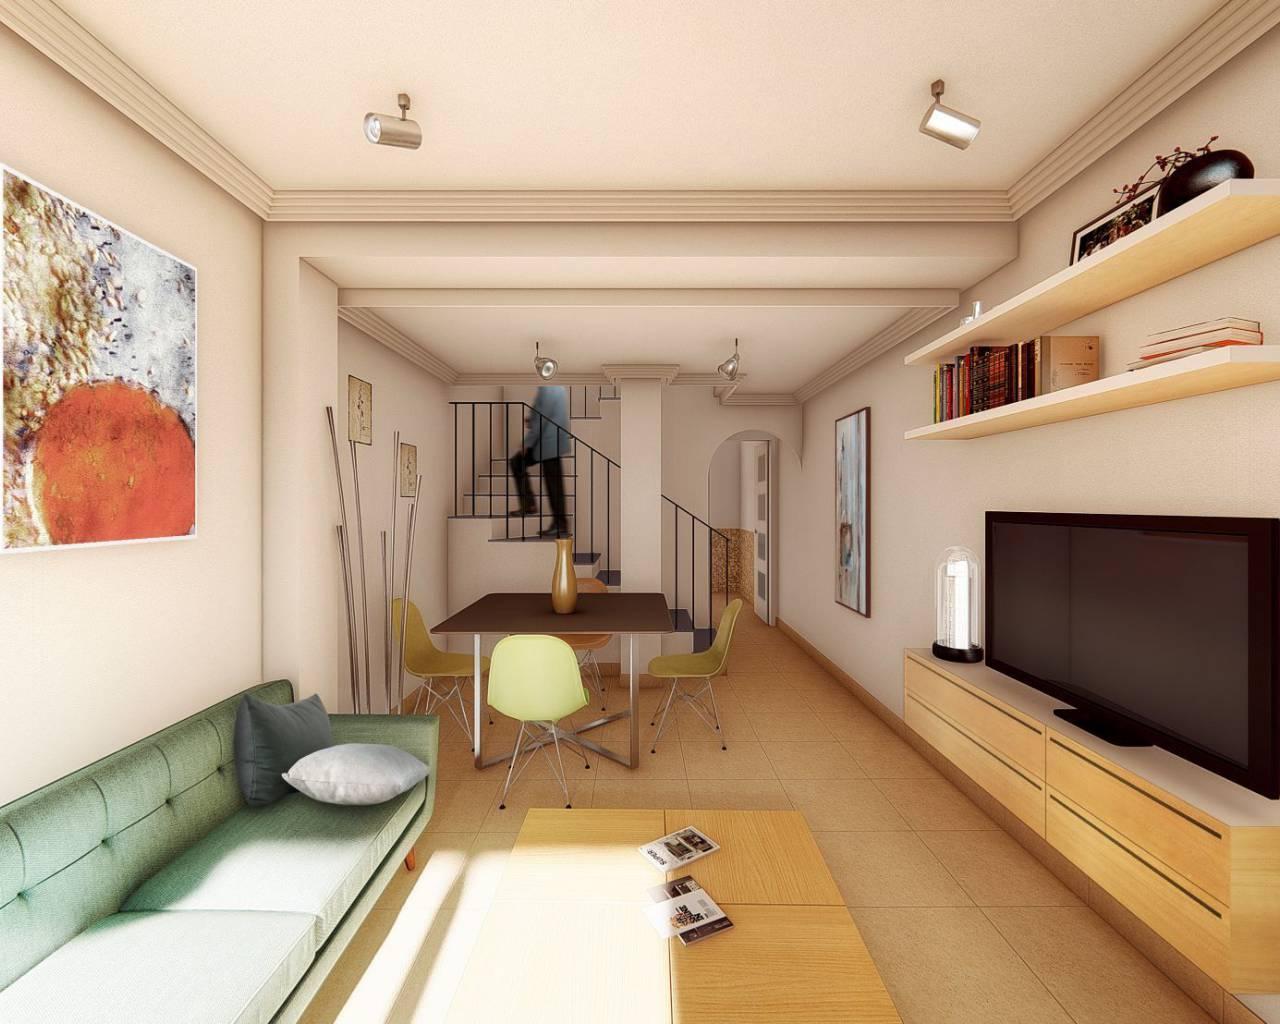 nieuwbouw-geschakelde-woning-duplex-torre-pacheco-santa-rosalia_4604_xl